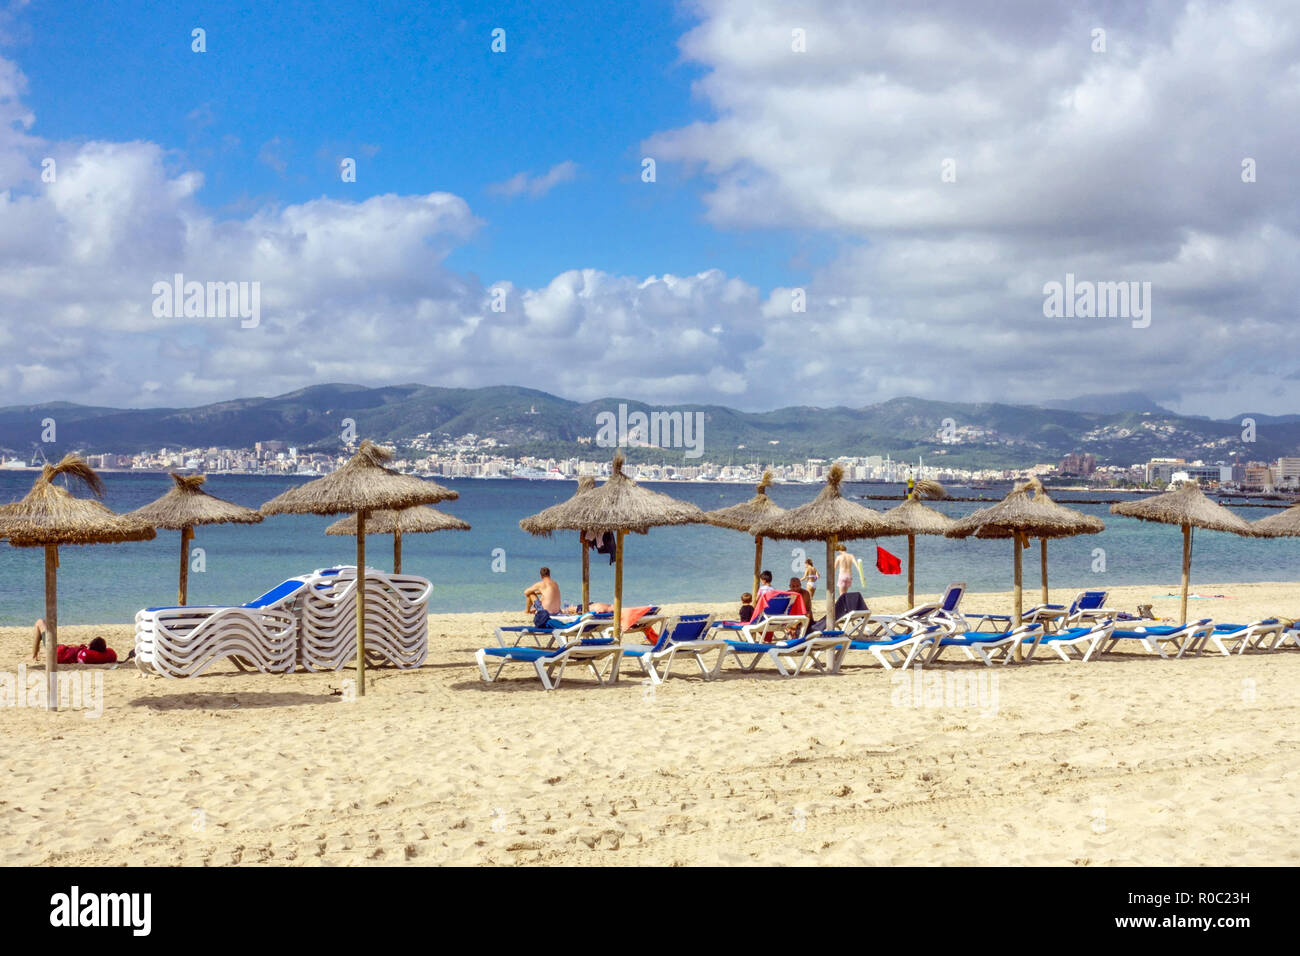 Palma de Mallorca Beach at seaside, district Ciutat Jardi - Stock Image